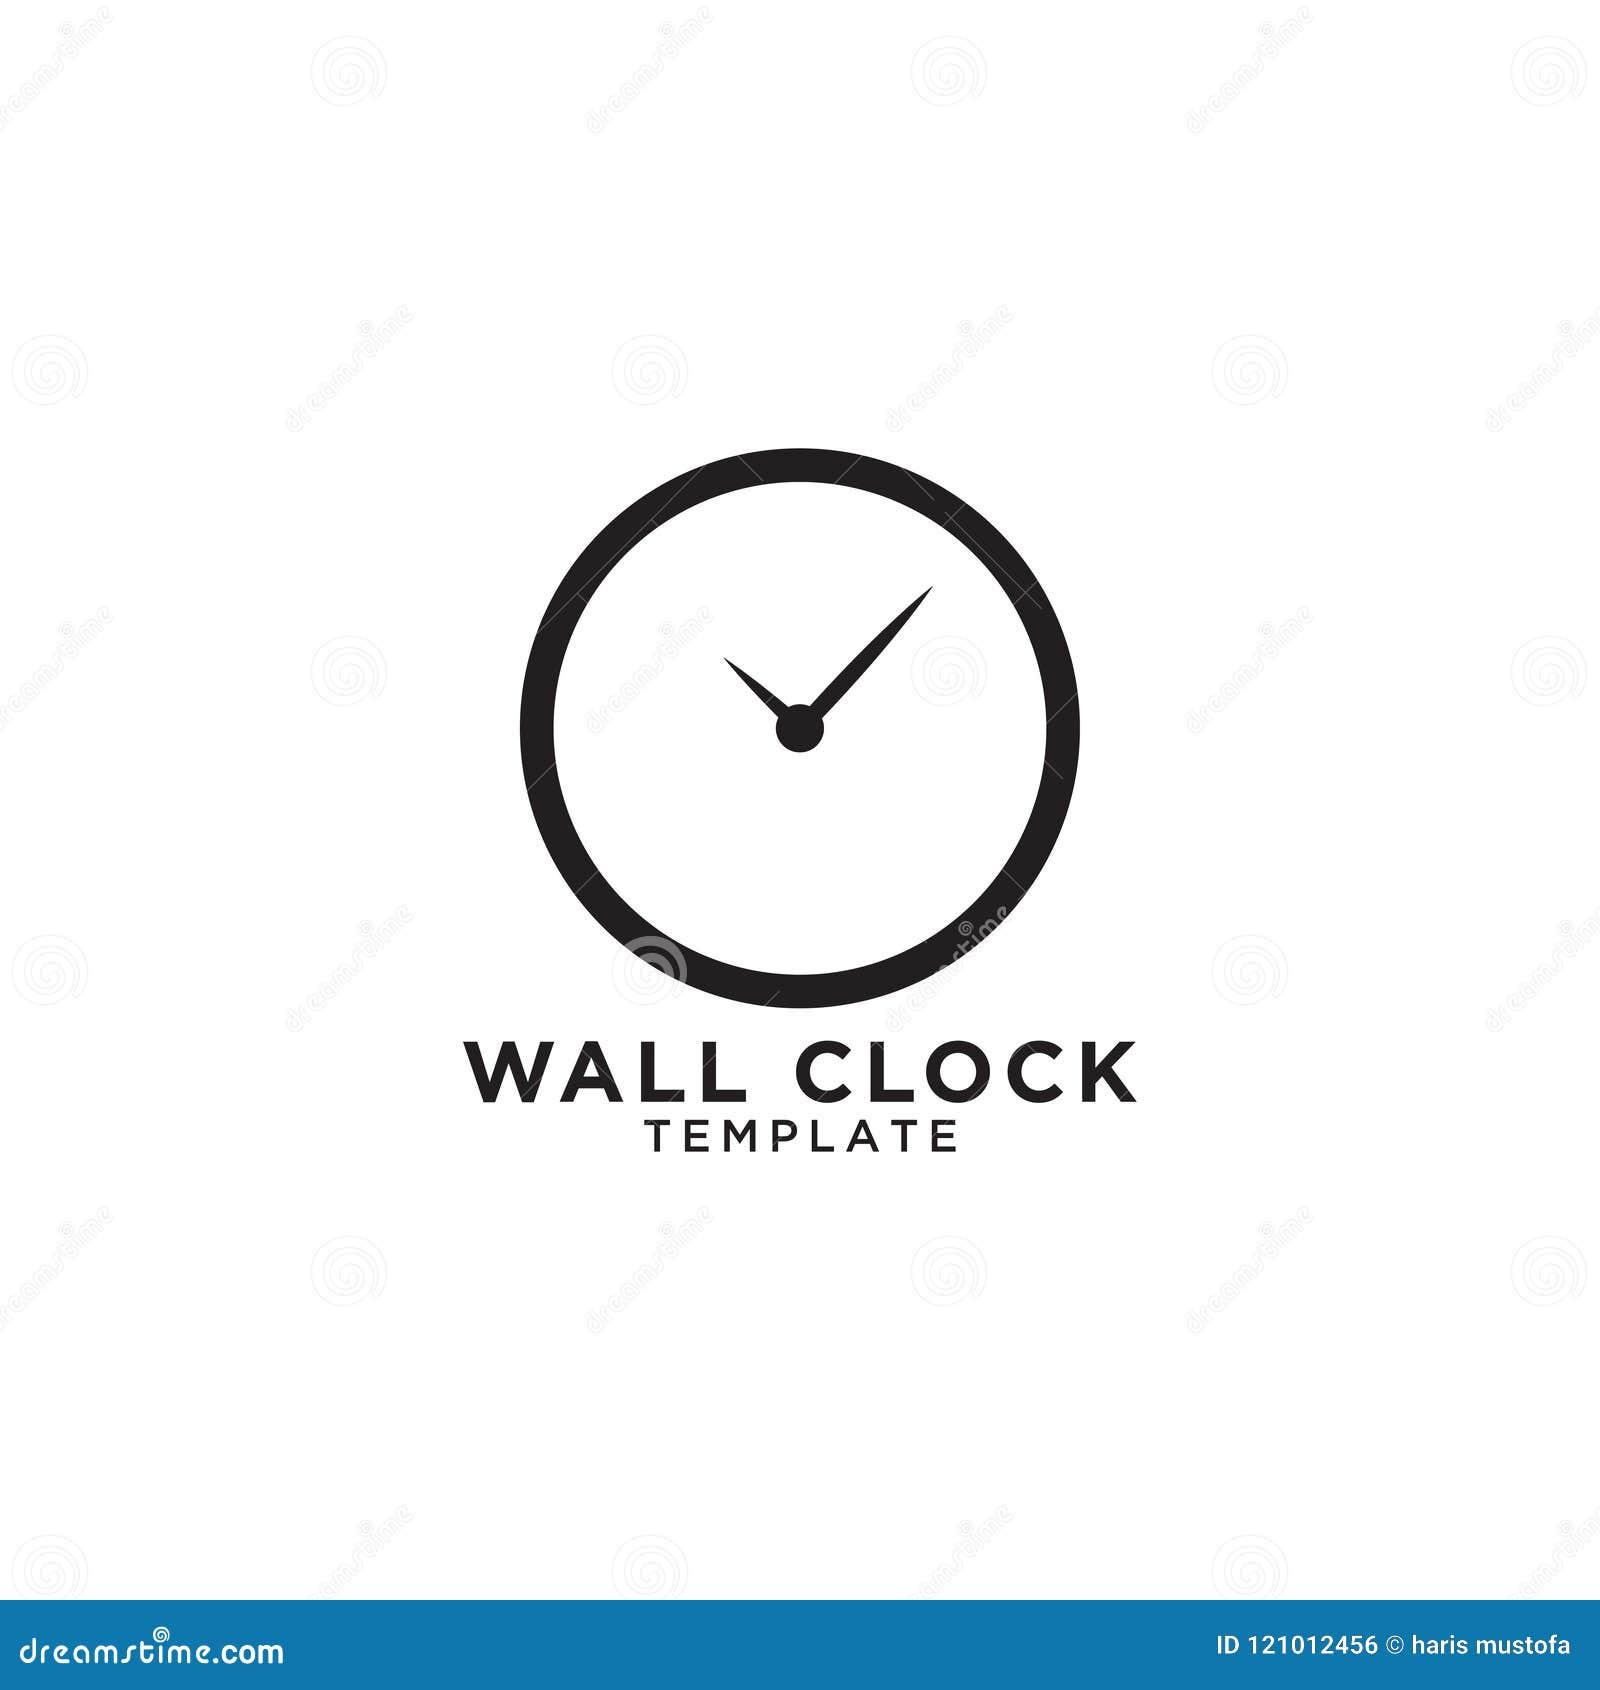 Wall Clock Logo Design Template Stock Vector - Illustration of ...